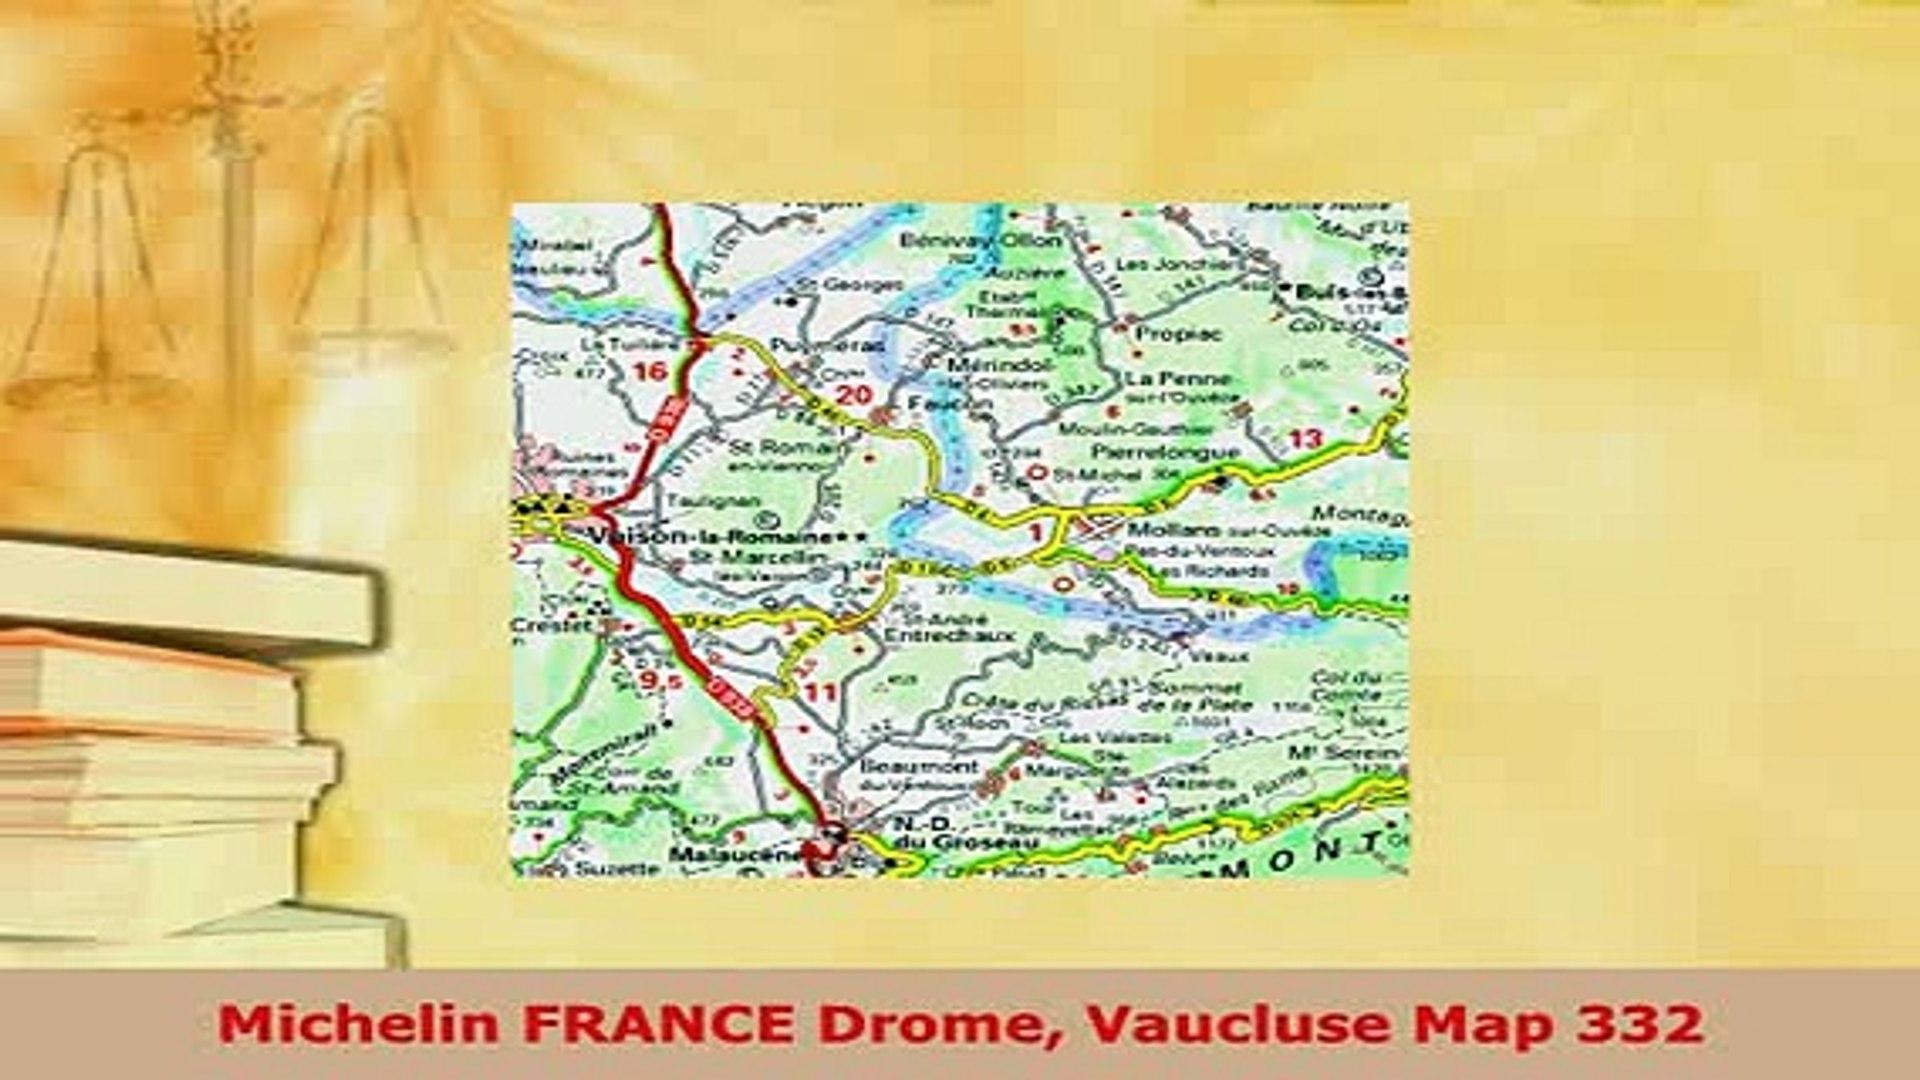 PDF Michelin FRANCE Drome Vaucluse Map 332 Download Online on provence map, digne-les-bains map, nain map, condell park map, rockdale map, mondragon map, leeds castle map, corse map, mascot map, beacon hill map, newcastle map, sydney central business district map, aquitaine map, loir et cher map, loire map, riverstone map, lot map, bonnieux map, luberon map, aubagne map,